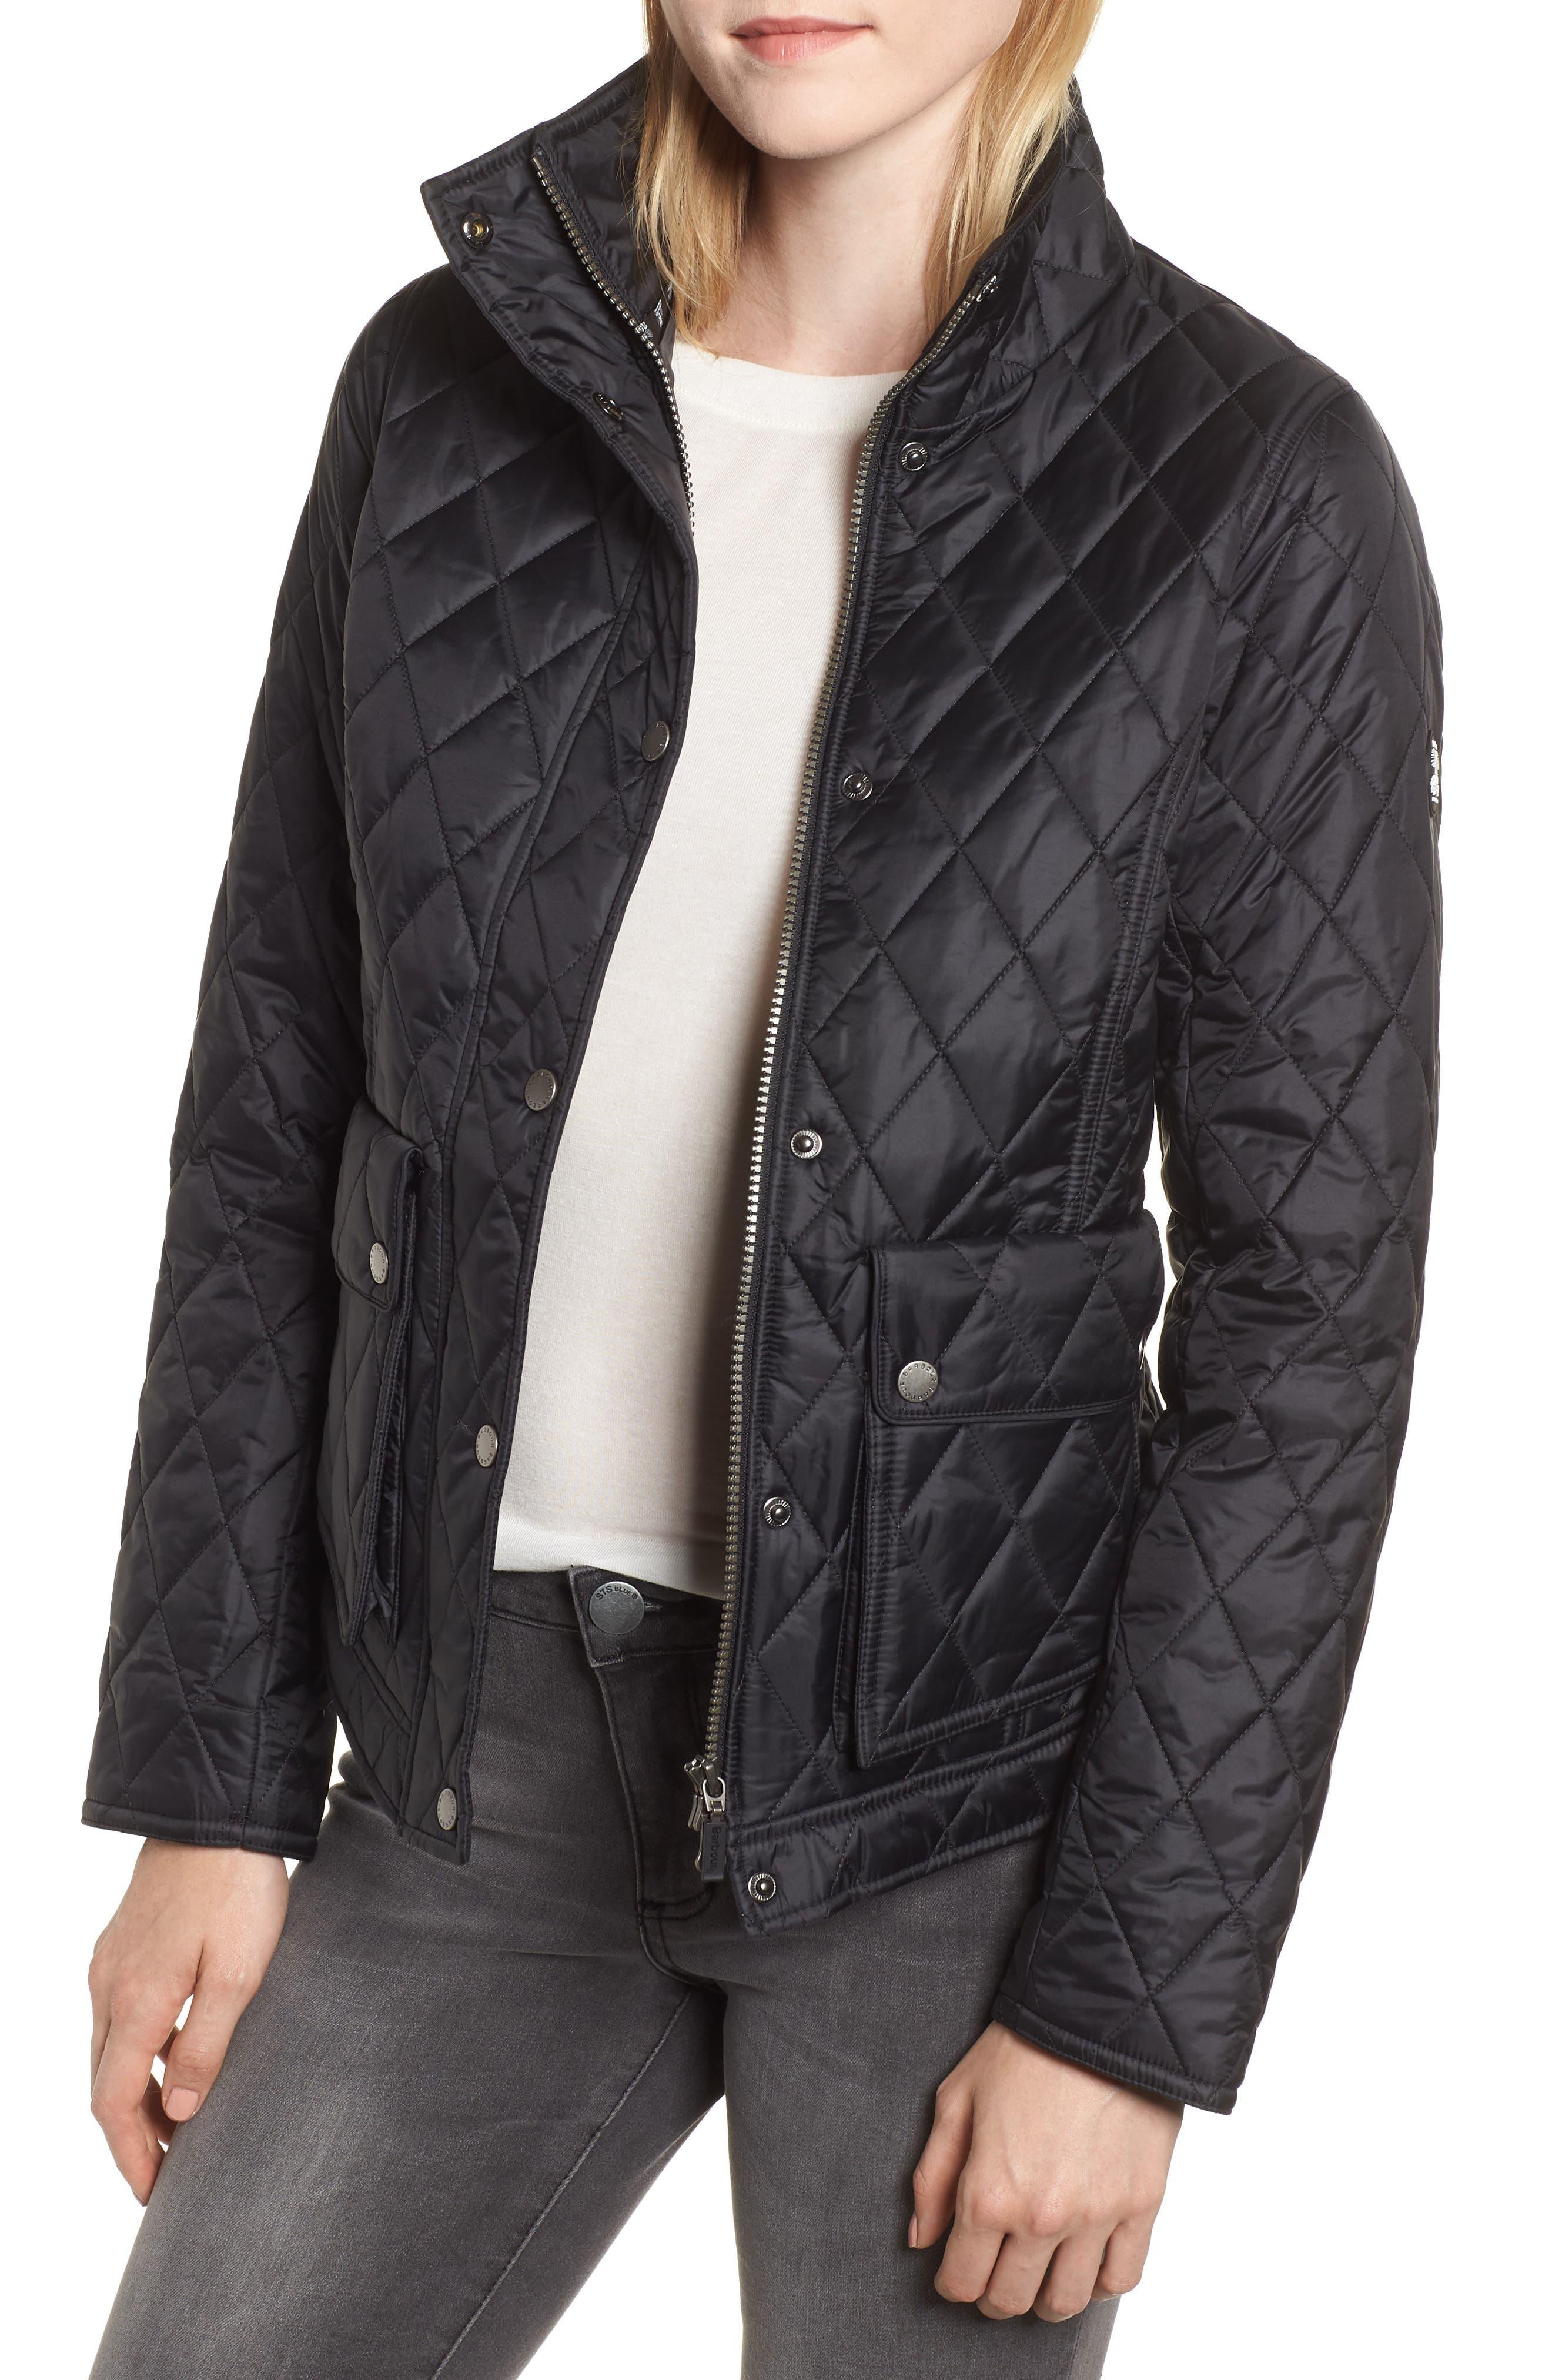 Barbour Cushat Quilted Jacket, US / 12 UK - Black